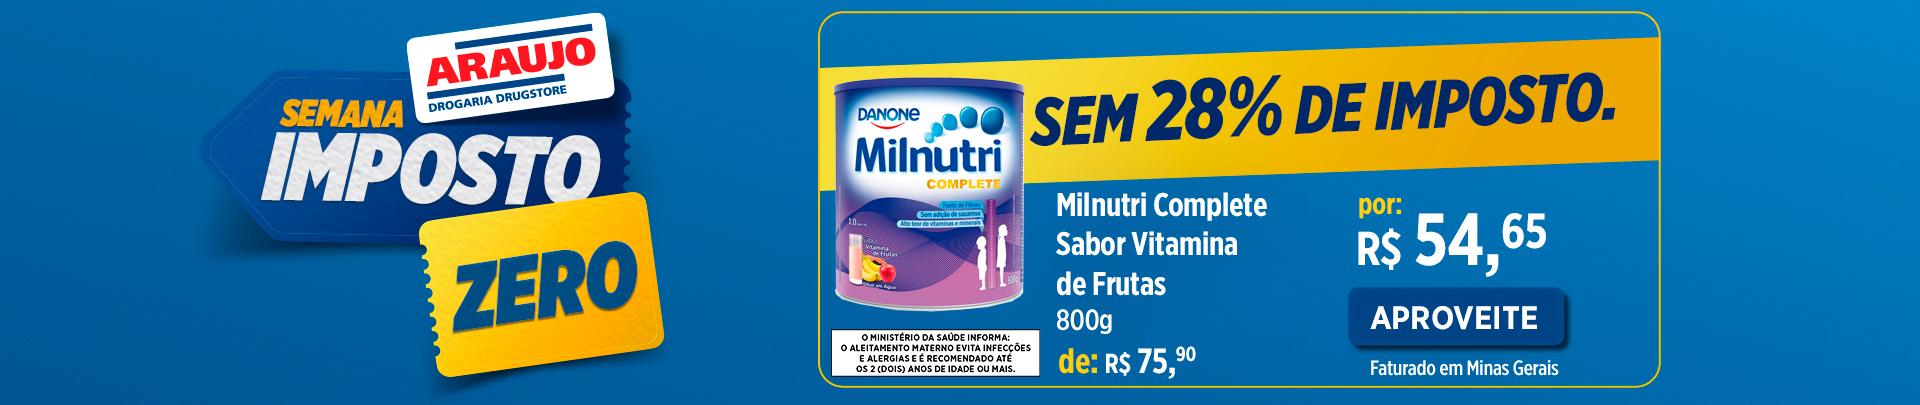 Milnutri Complete